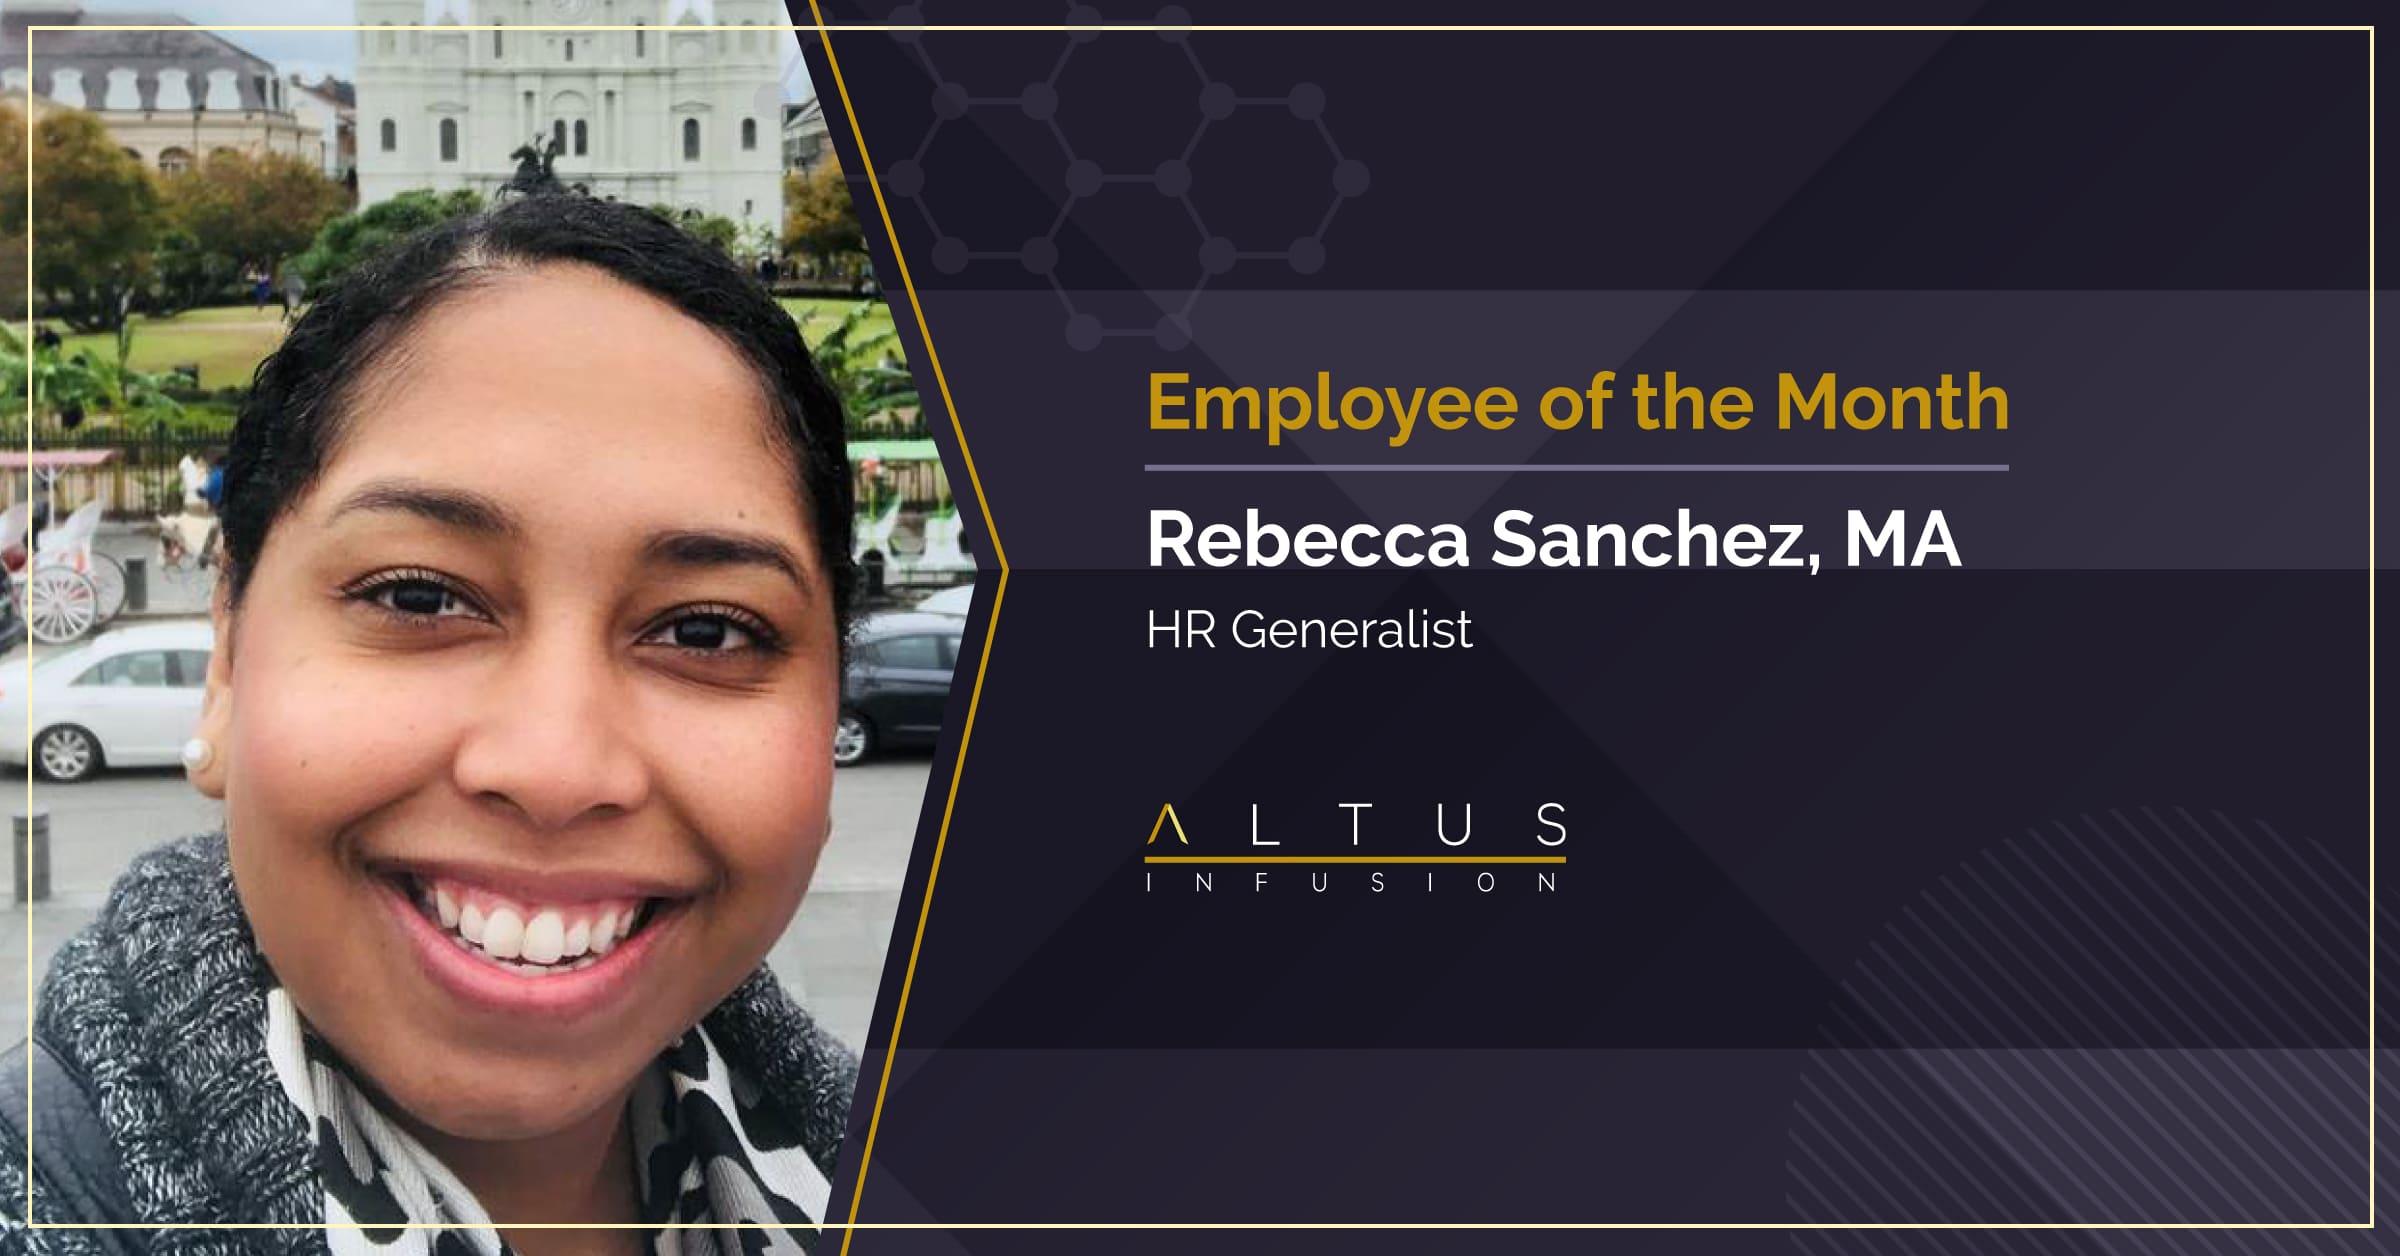 Congratulations, Rebecca Sanchez - December Employee of the Month